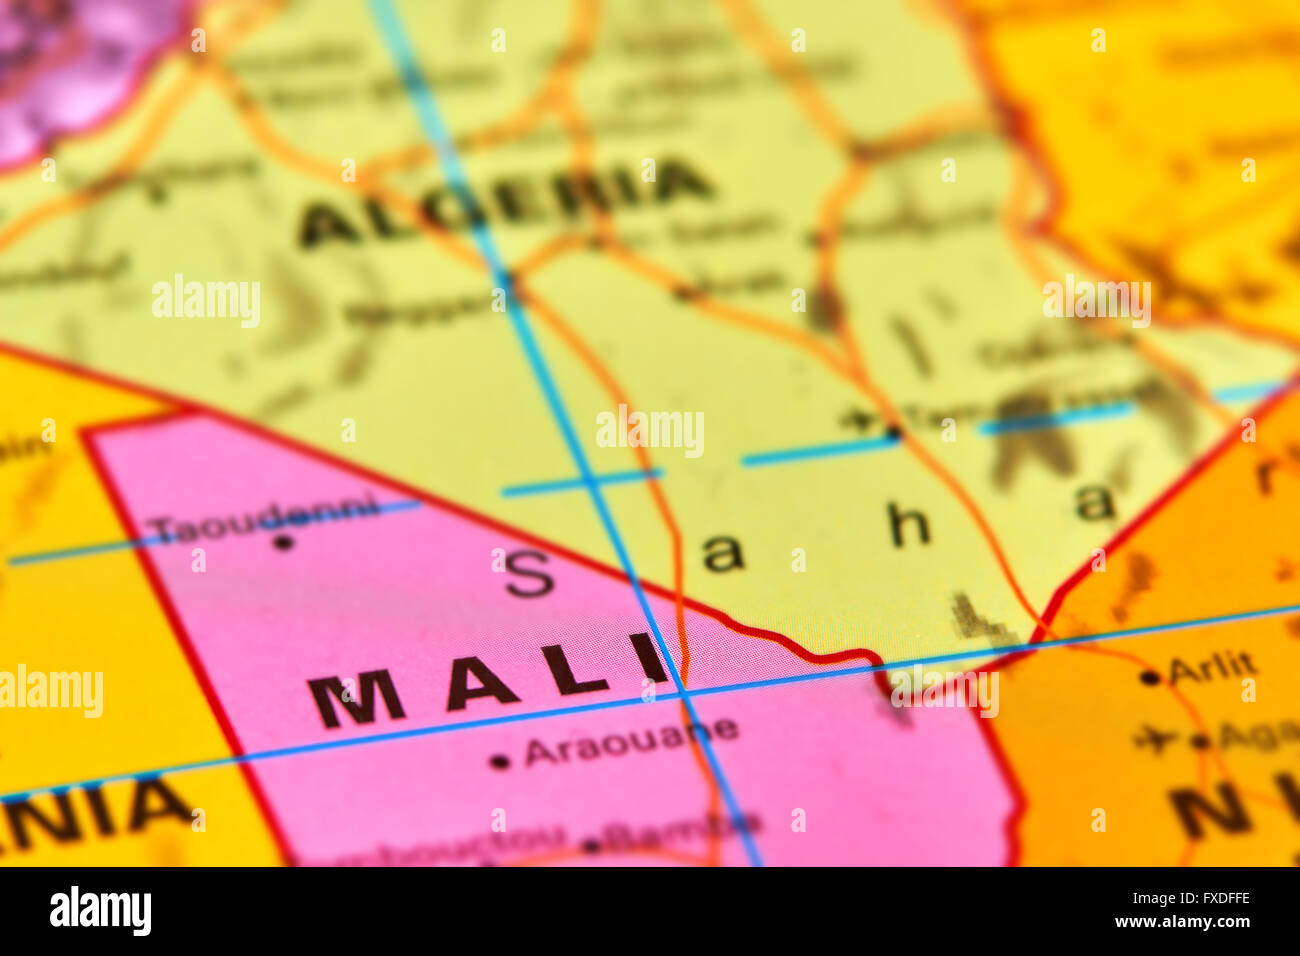 Mali-Land in Afrika auf der Weltkarte Stockbild